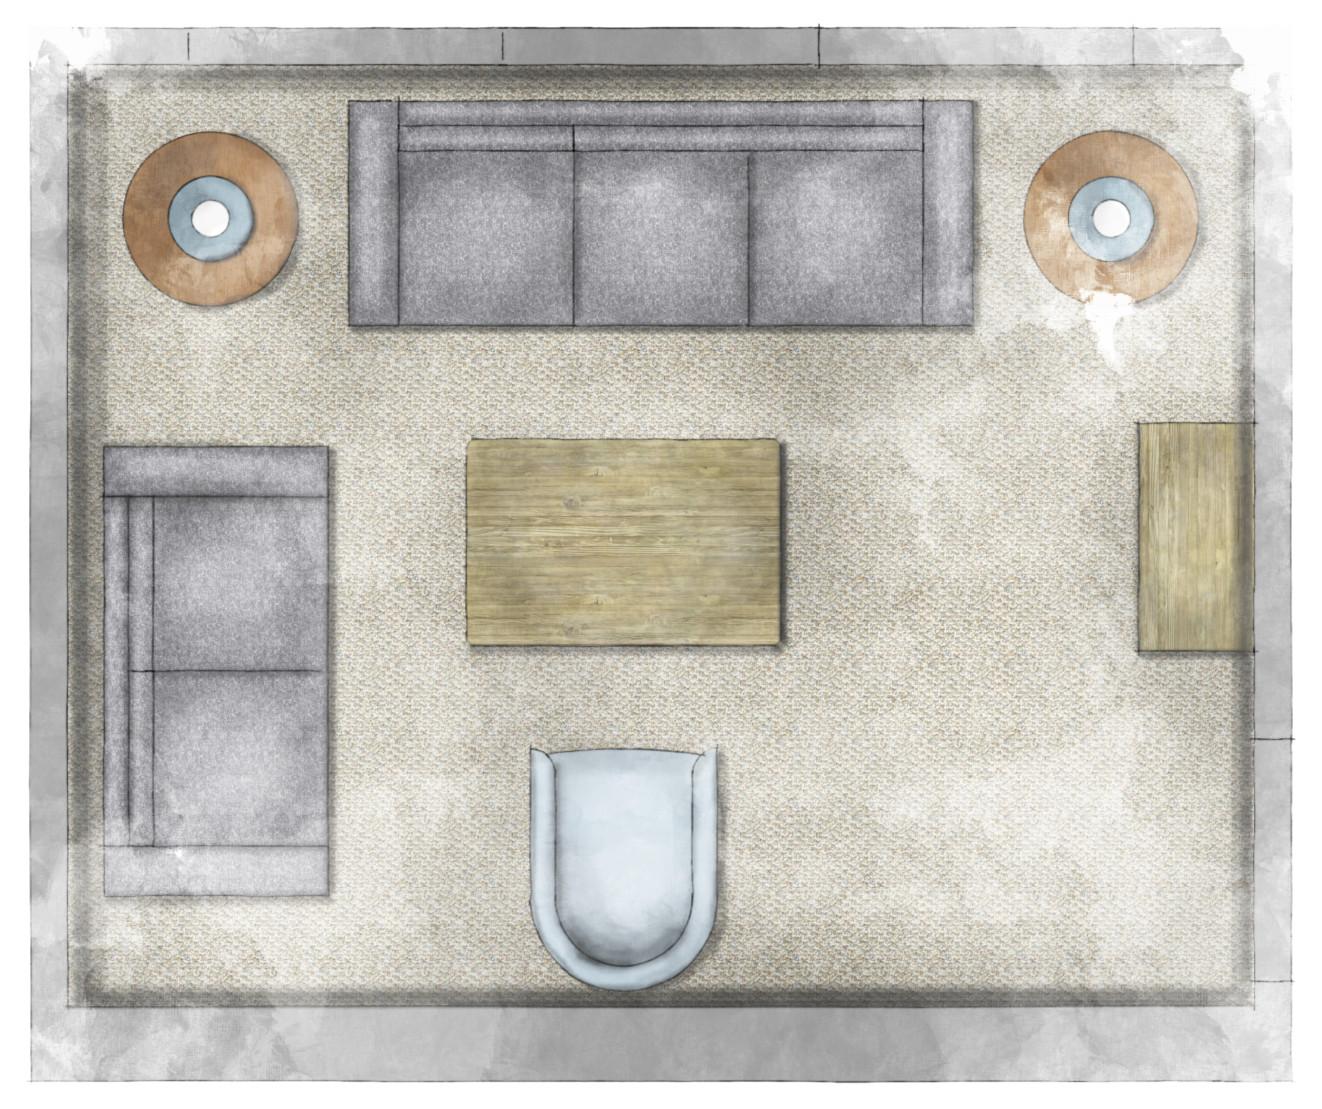 sketchup workshop in belfast anita brown 3d visualisation hand illustrated effect